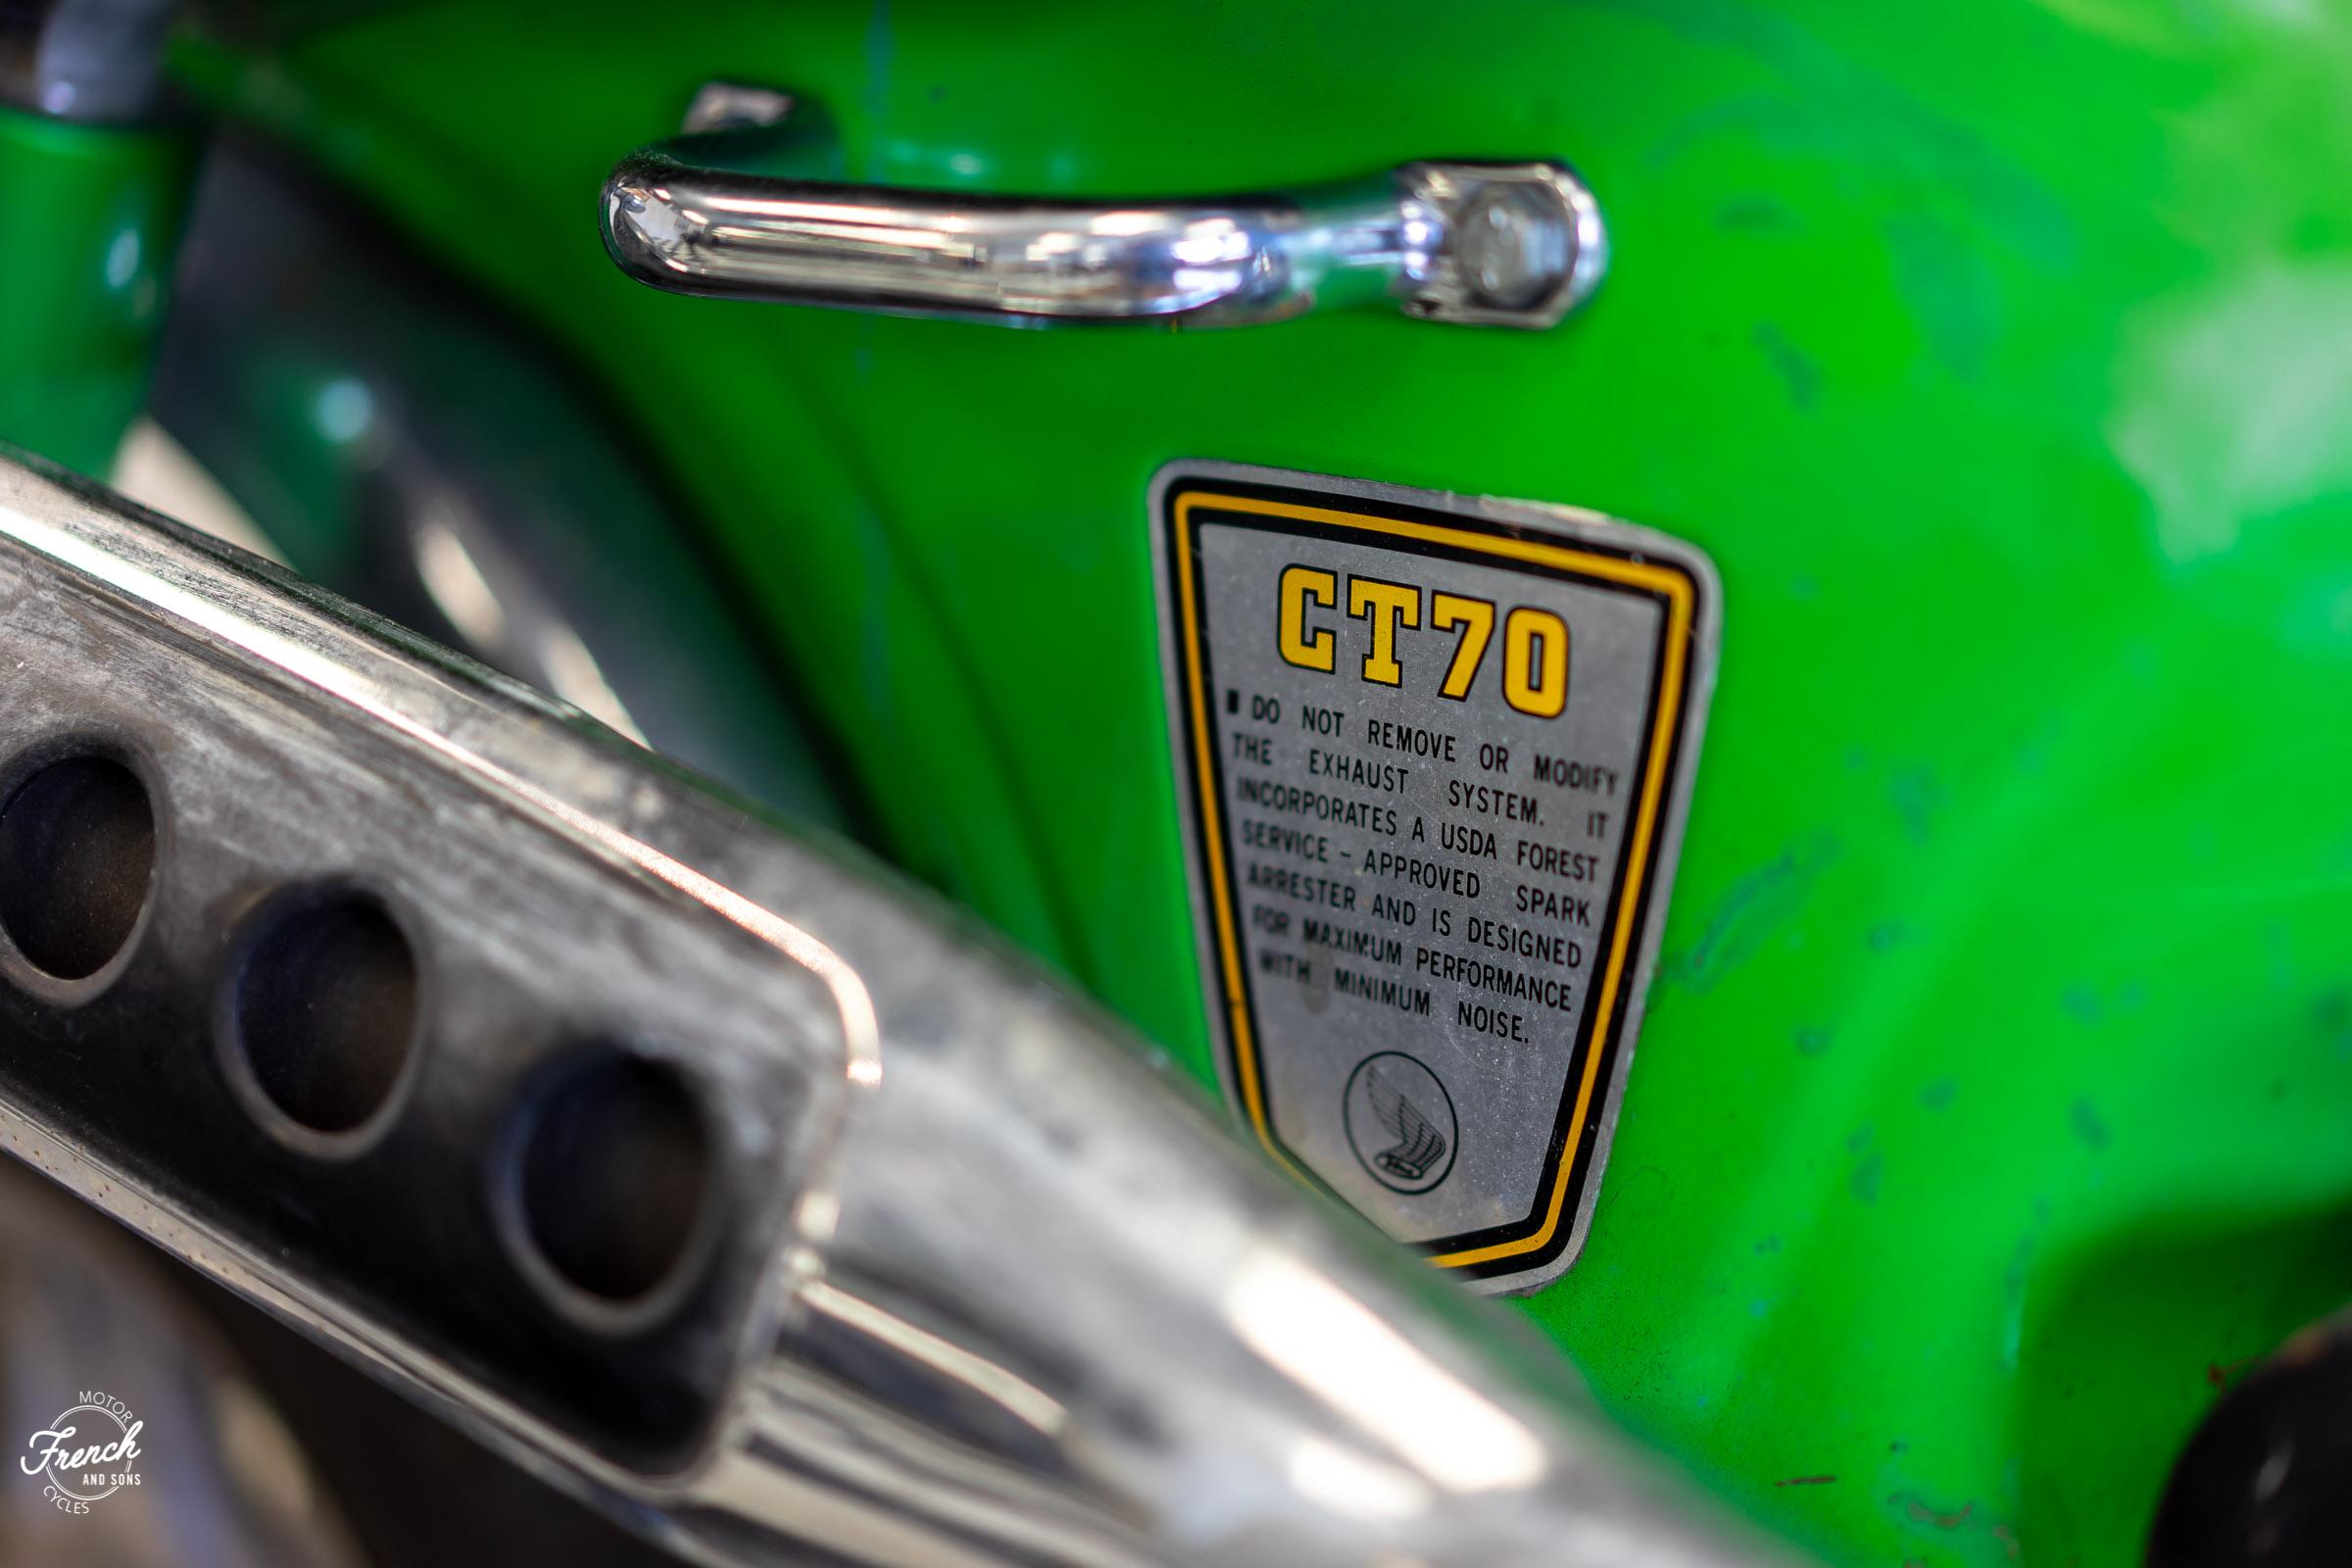 1975hondact70green-9.jpg